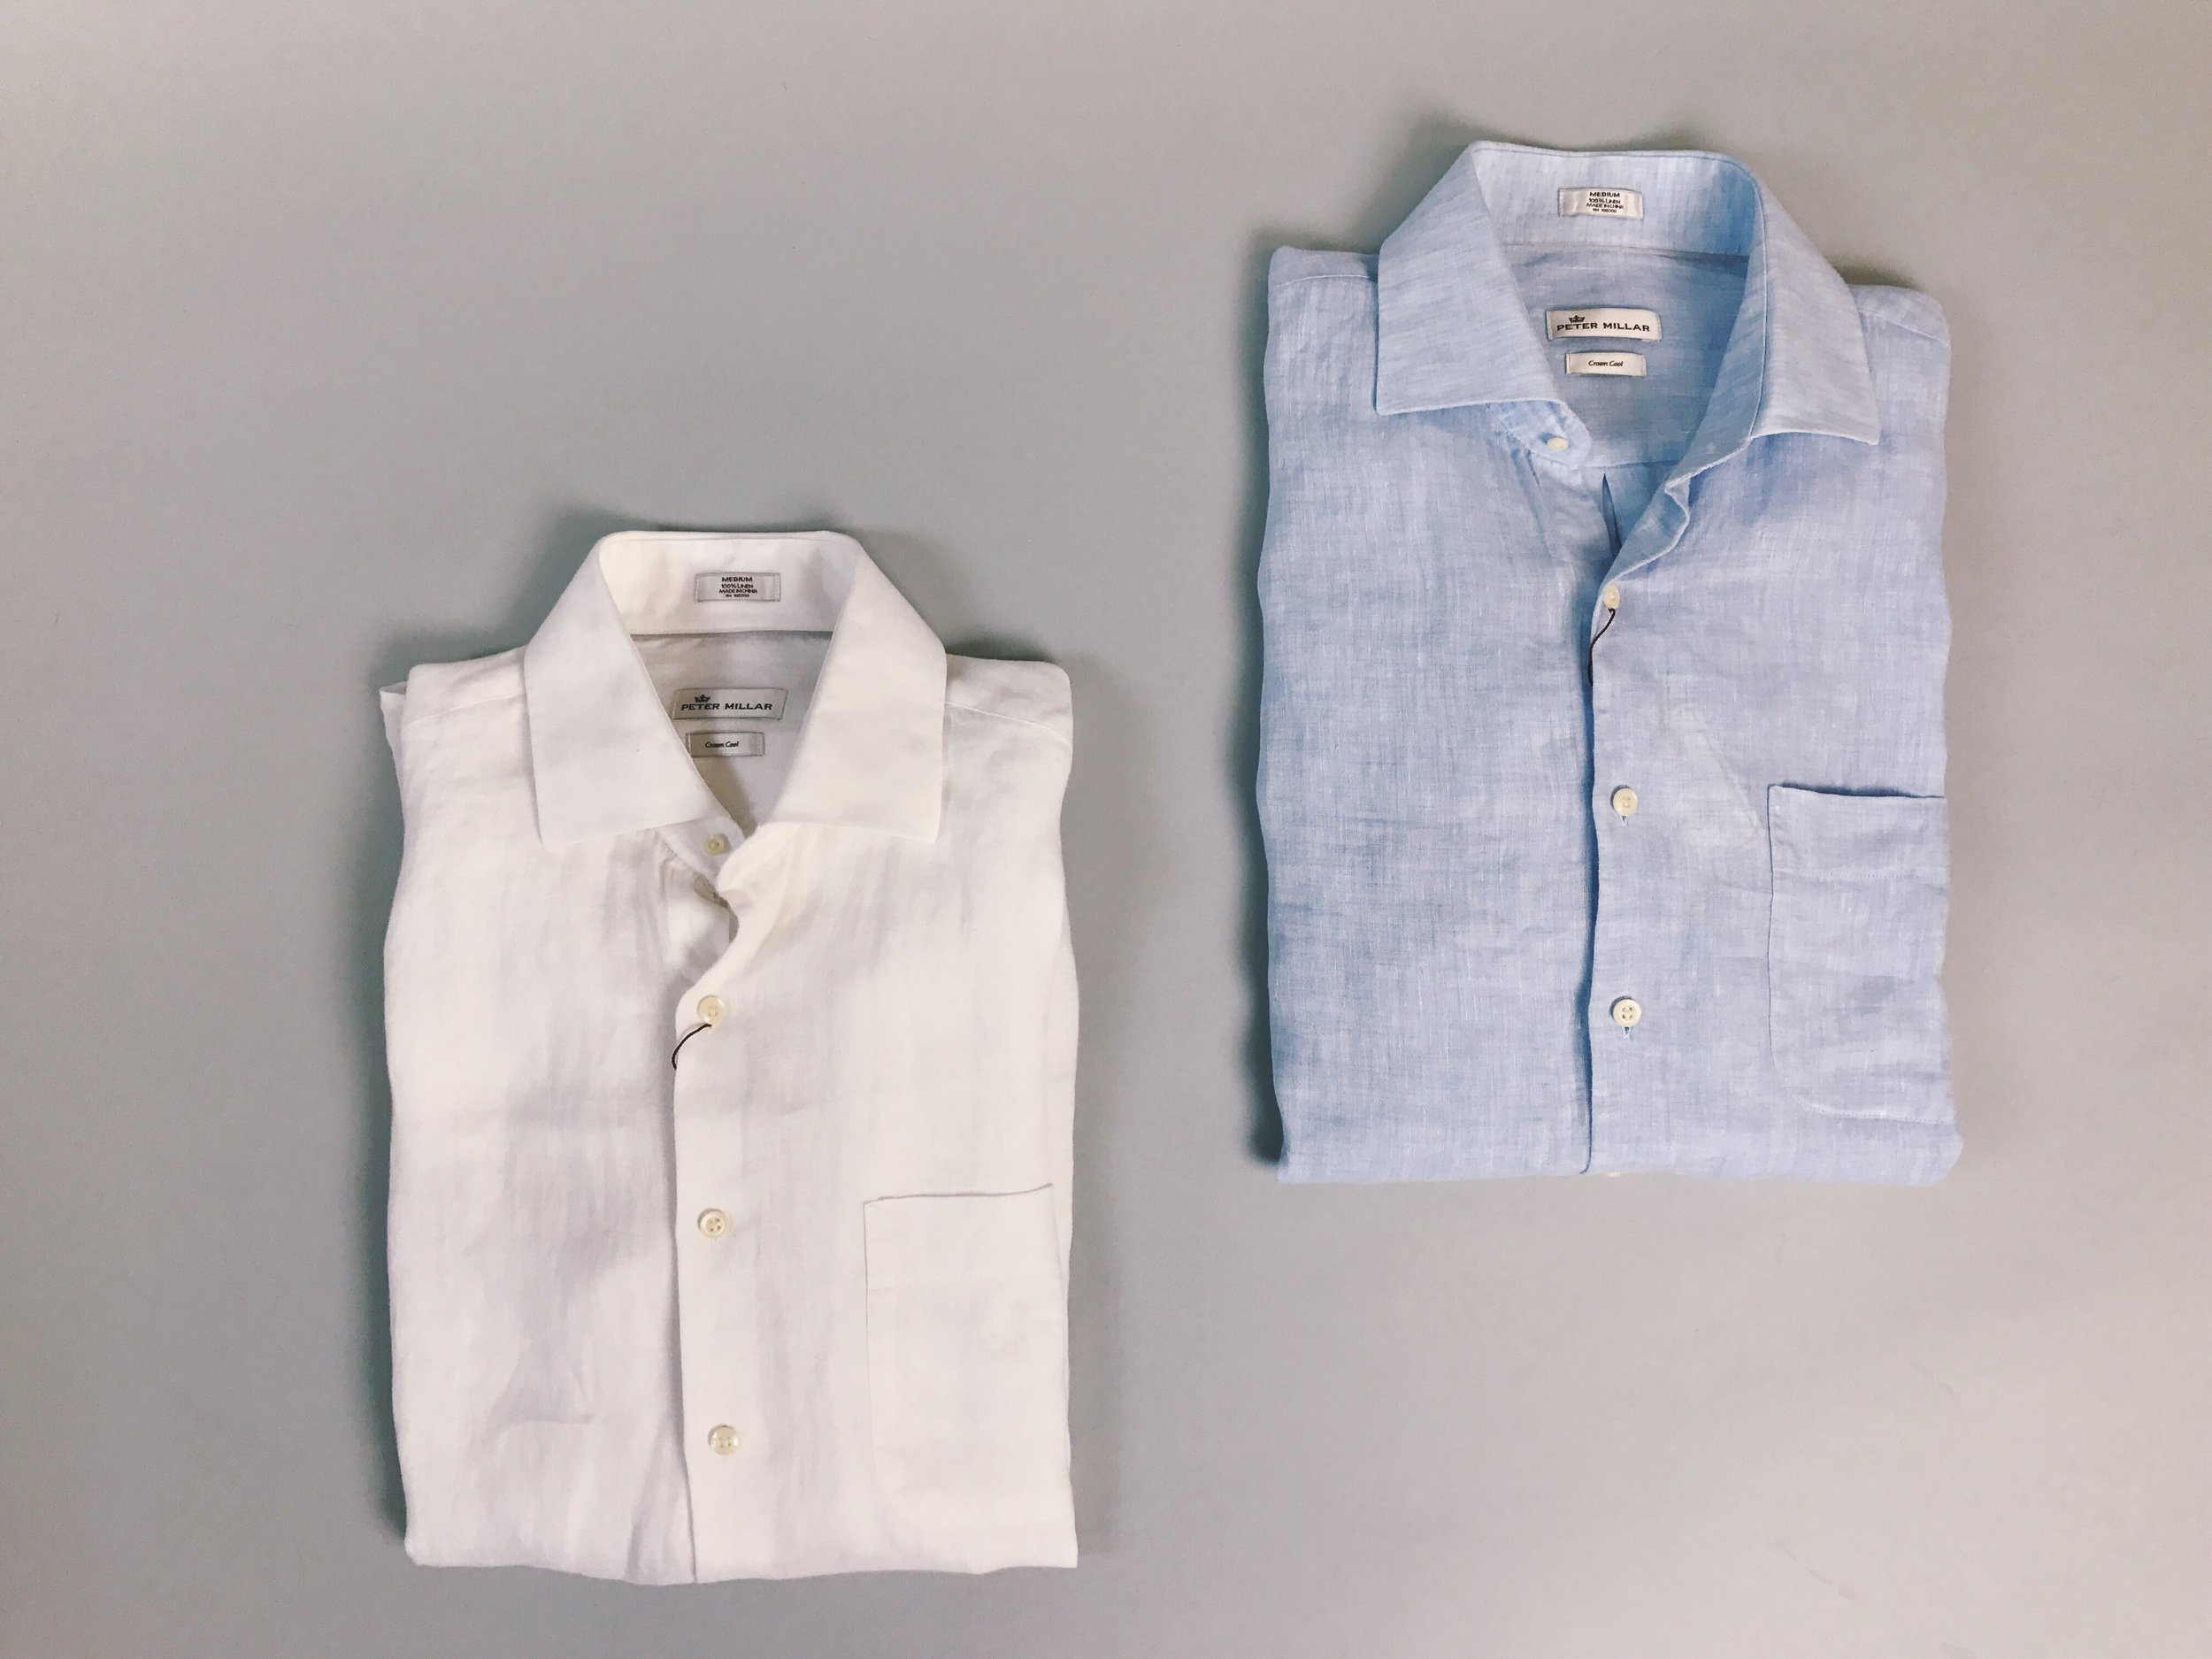 peter millar linen shirt at the qg